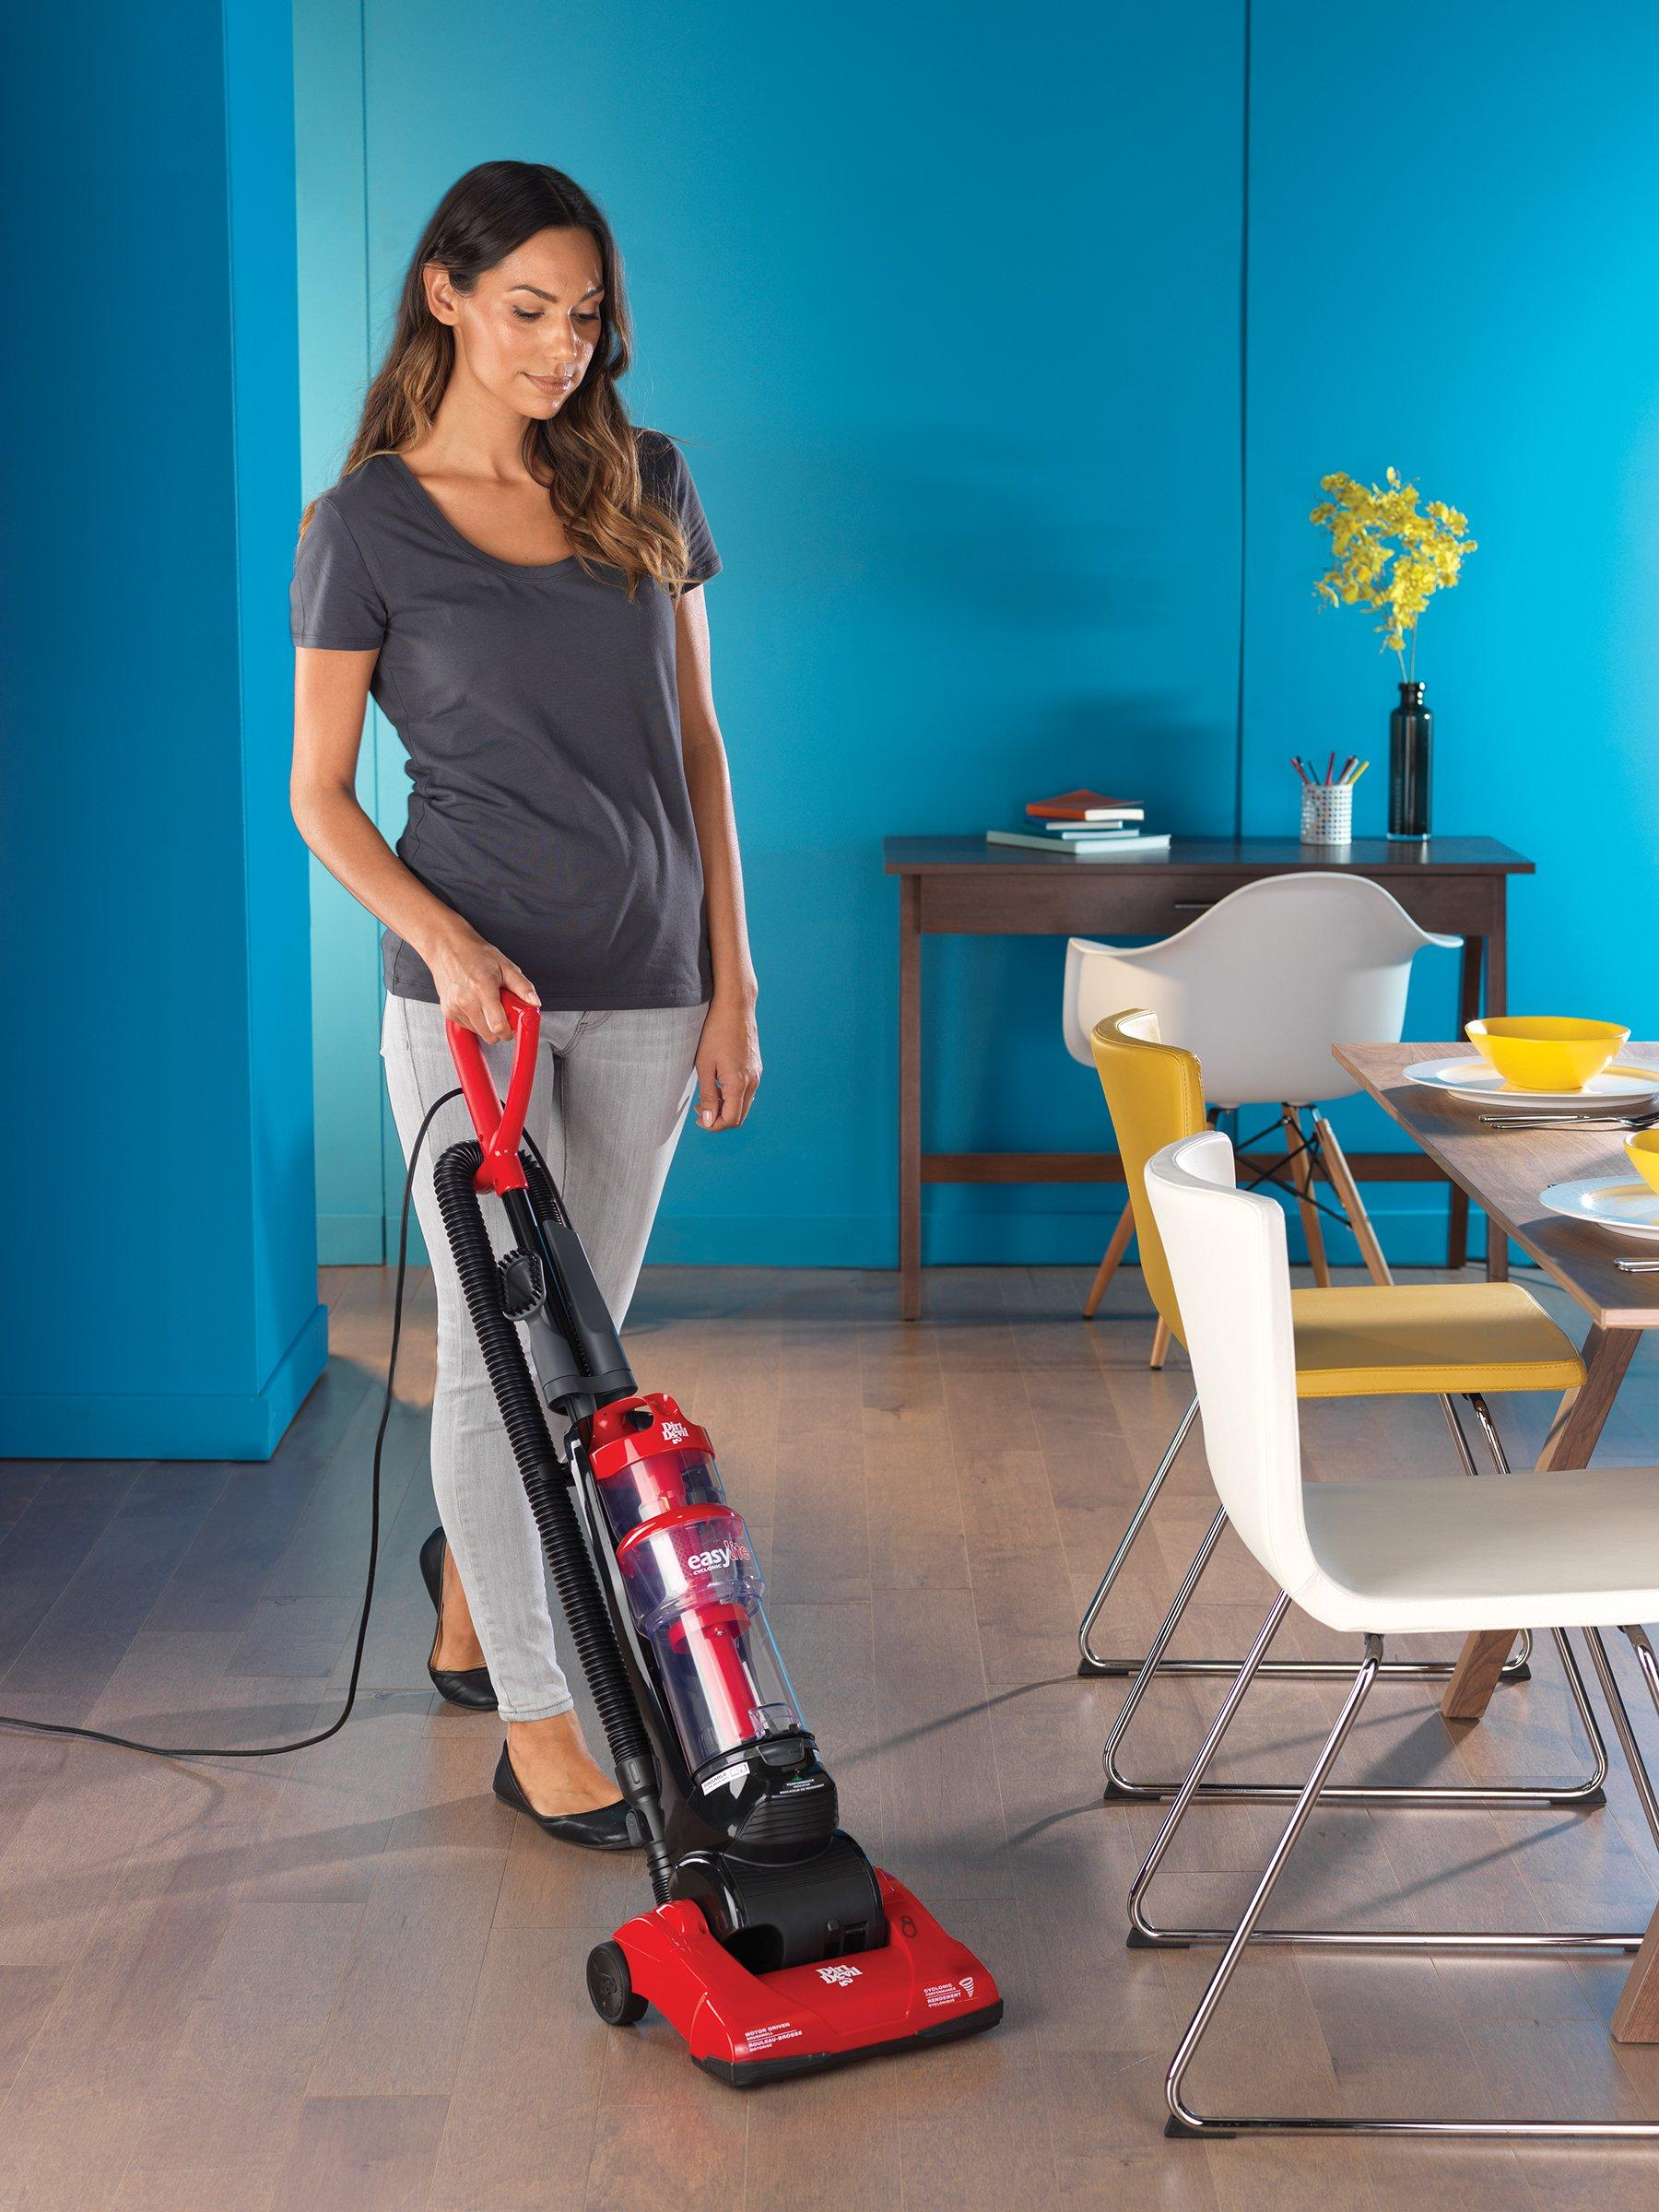 Easy Lite Cyclonic Upright Vacuum4